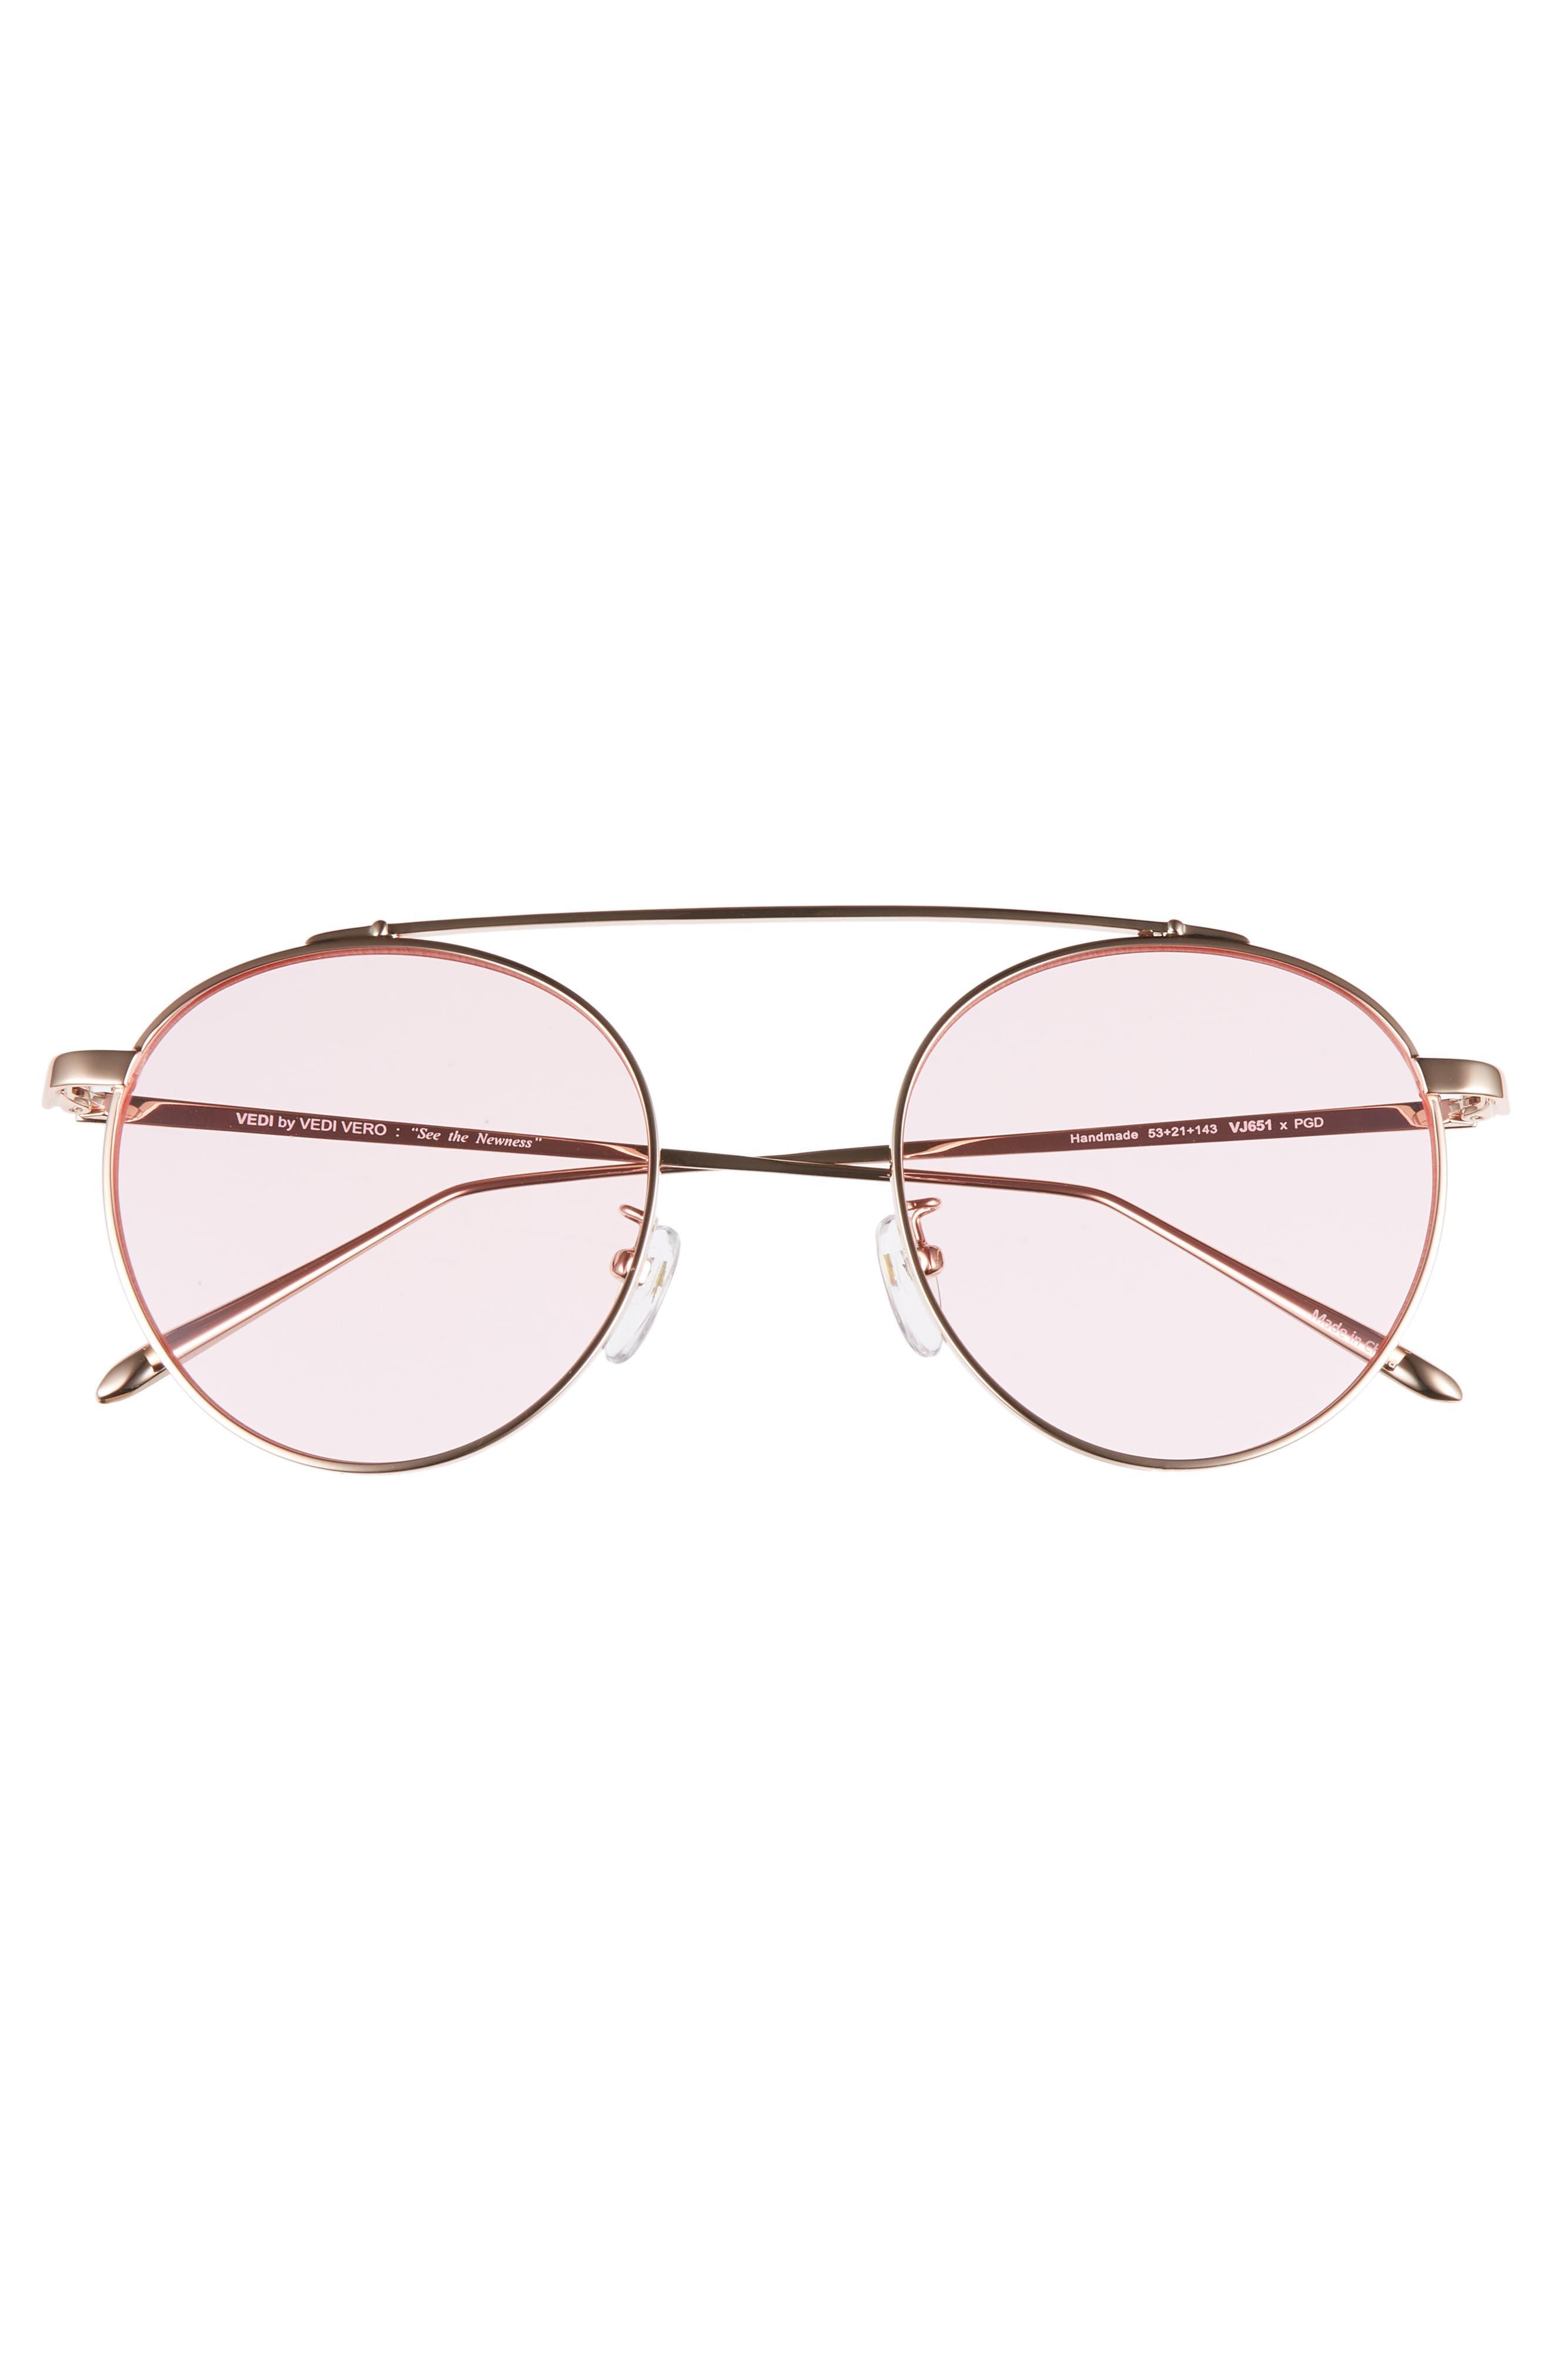 VEDI VERO,                             53mm Round Sunglasses,                             Alternate thumbnail 3, color,                             ROSEGLD/PINK